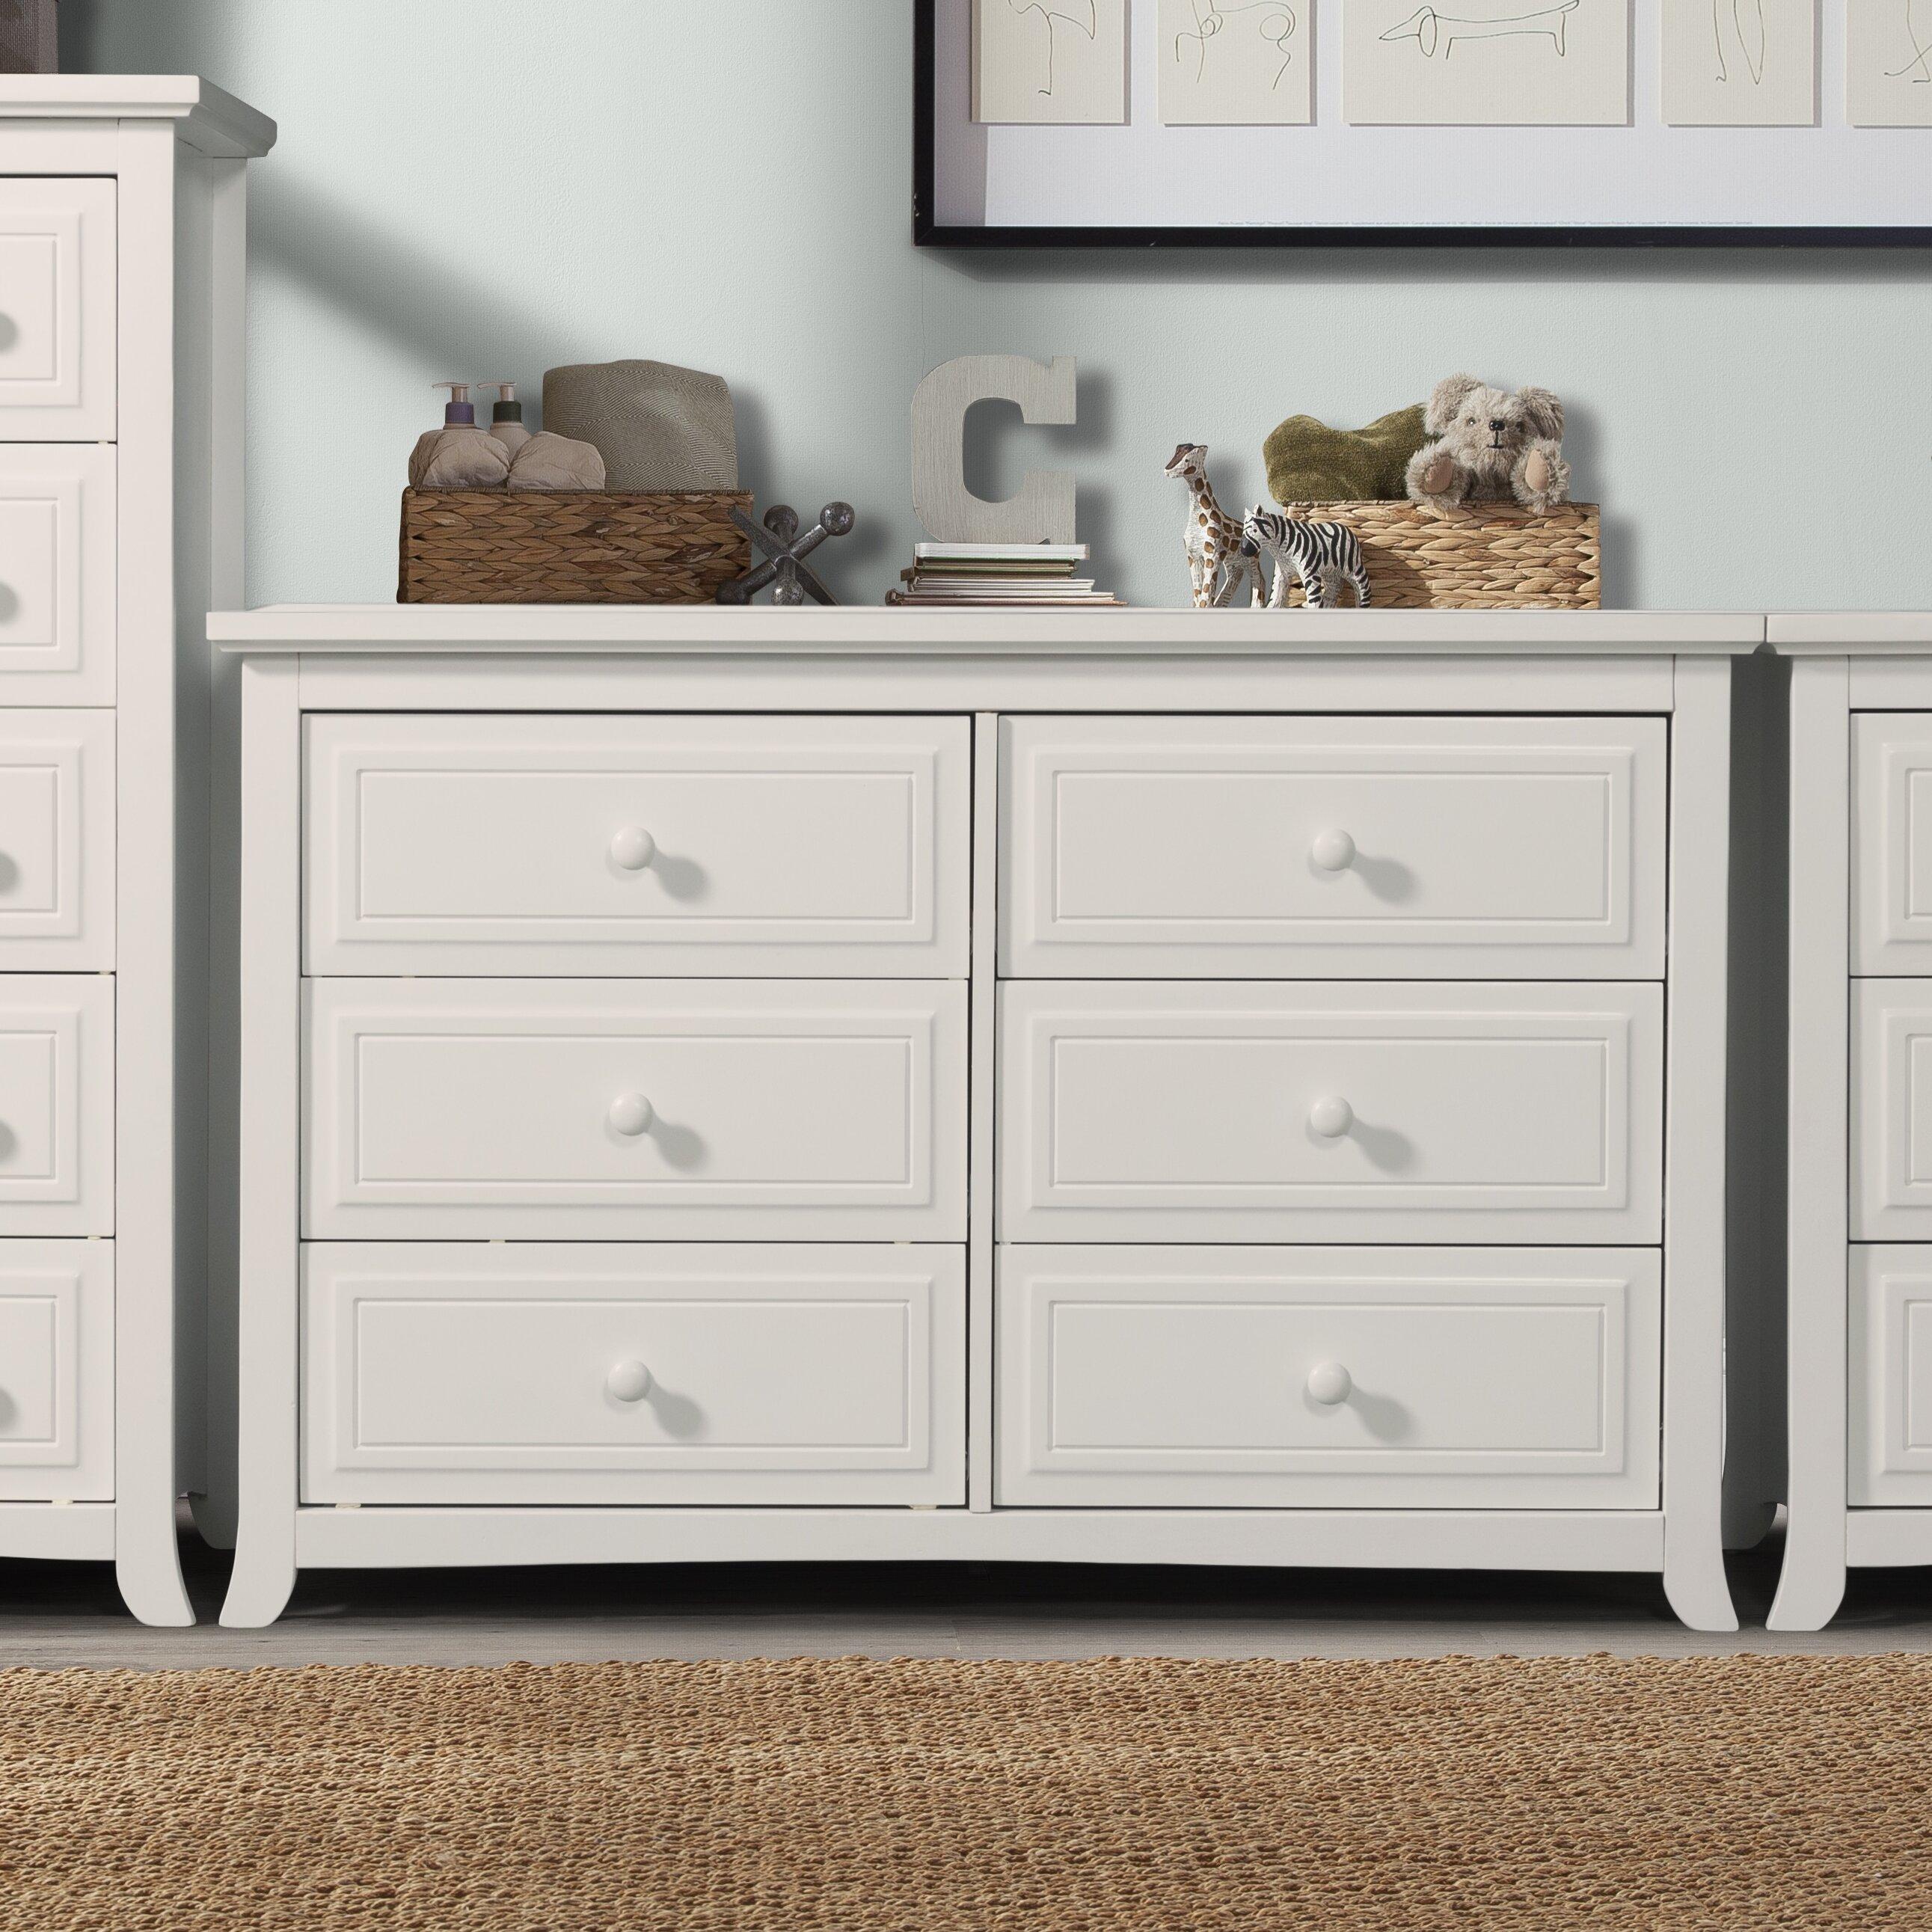 trends childrens room nursery s dresser design for big project addison kid girl children